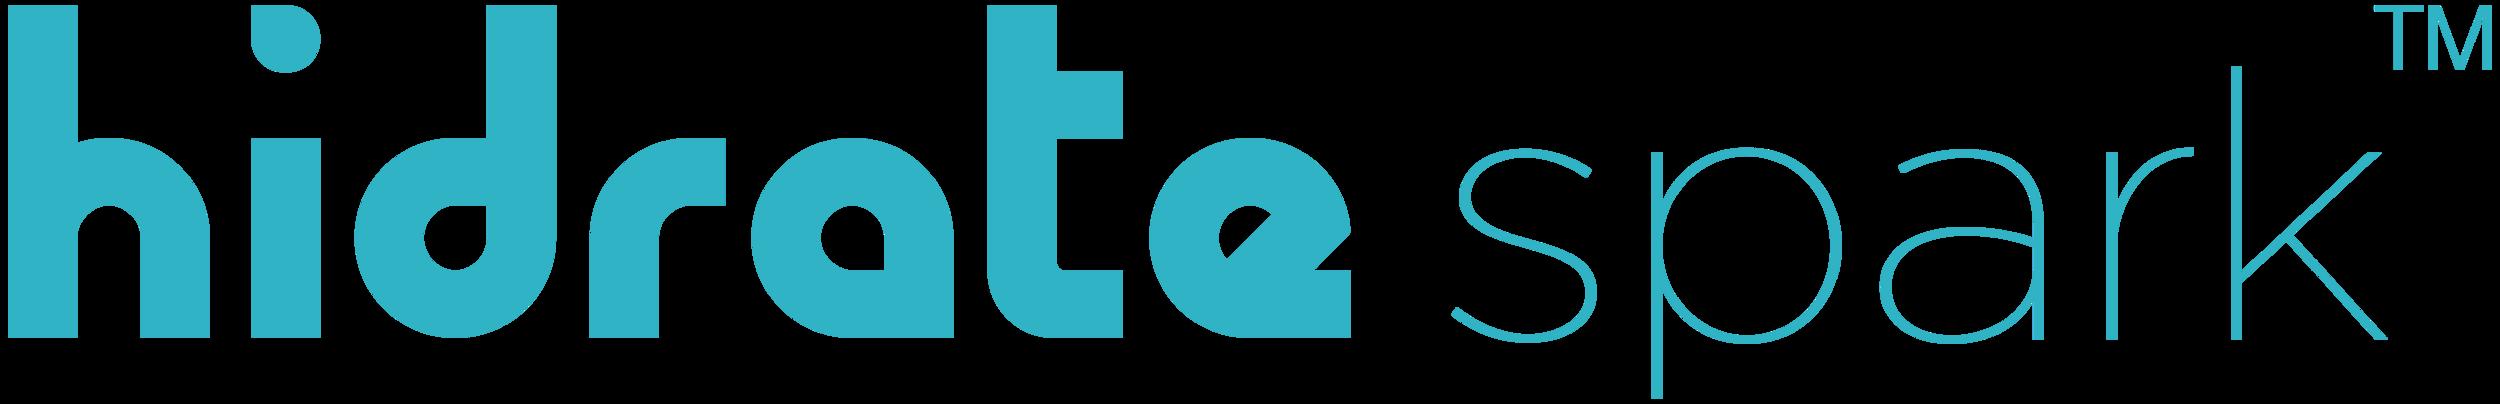 hidrate spark logo.png